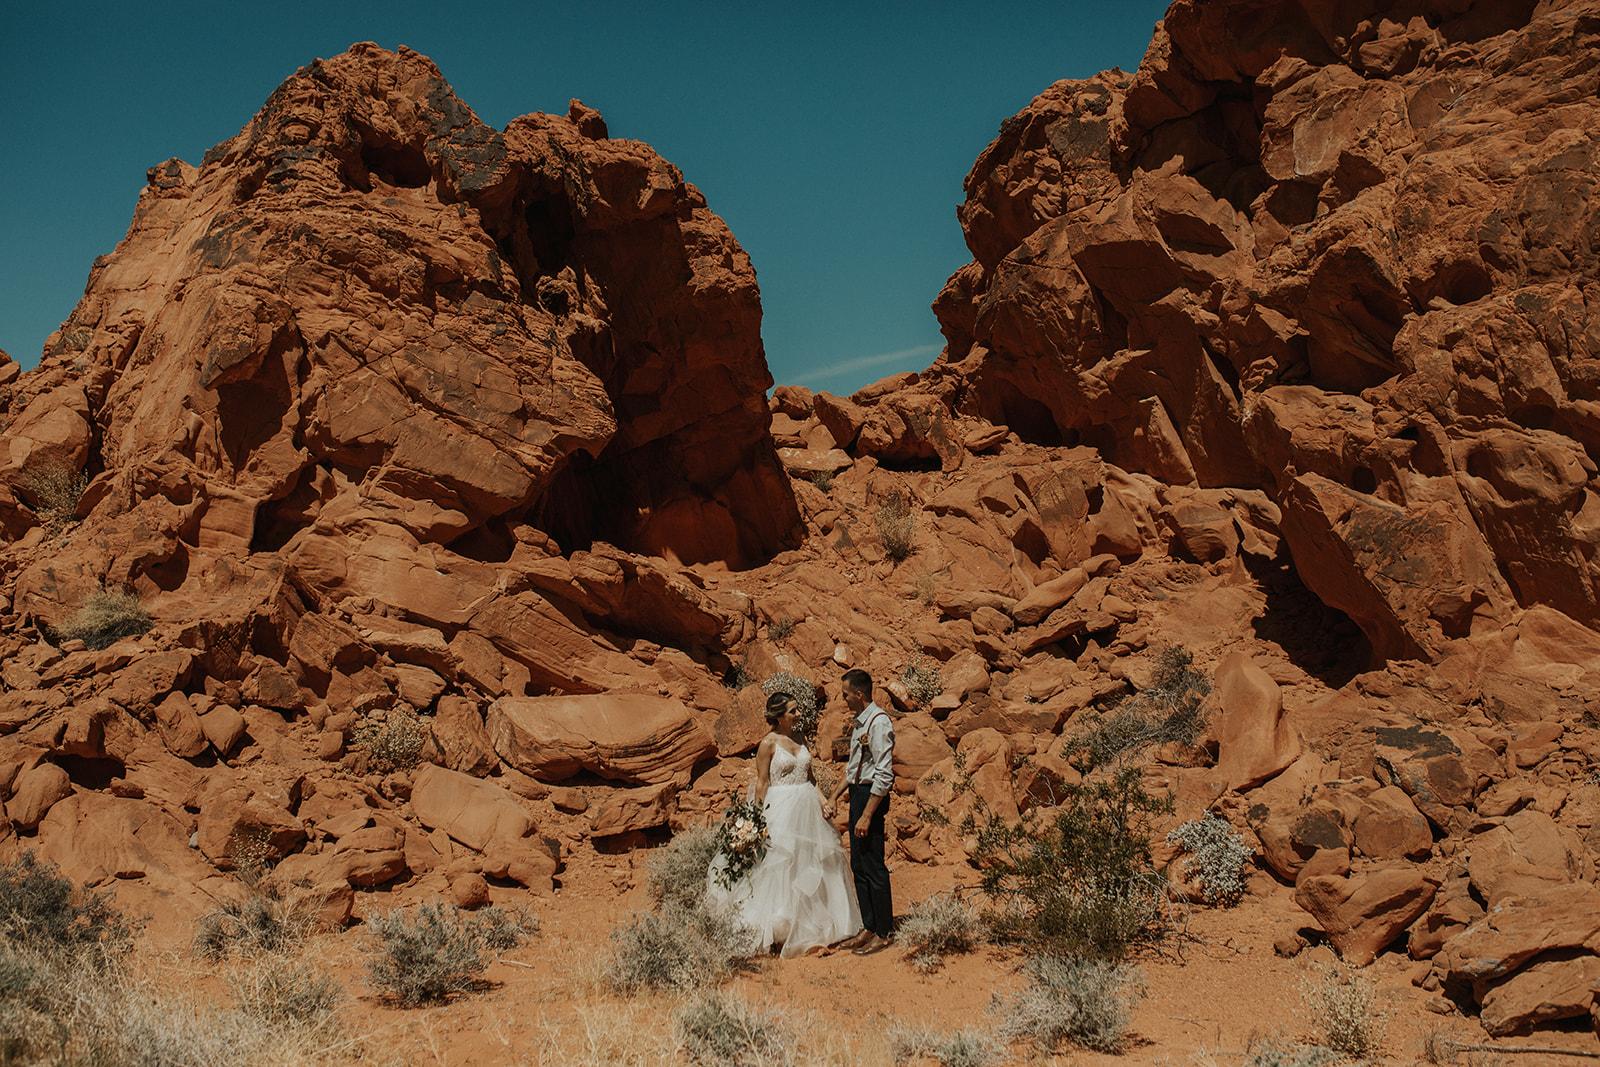 red rock desert portraits spokane bride and groom